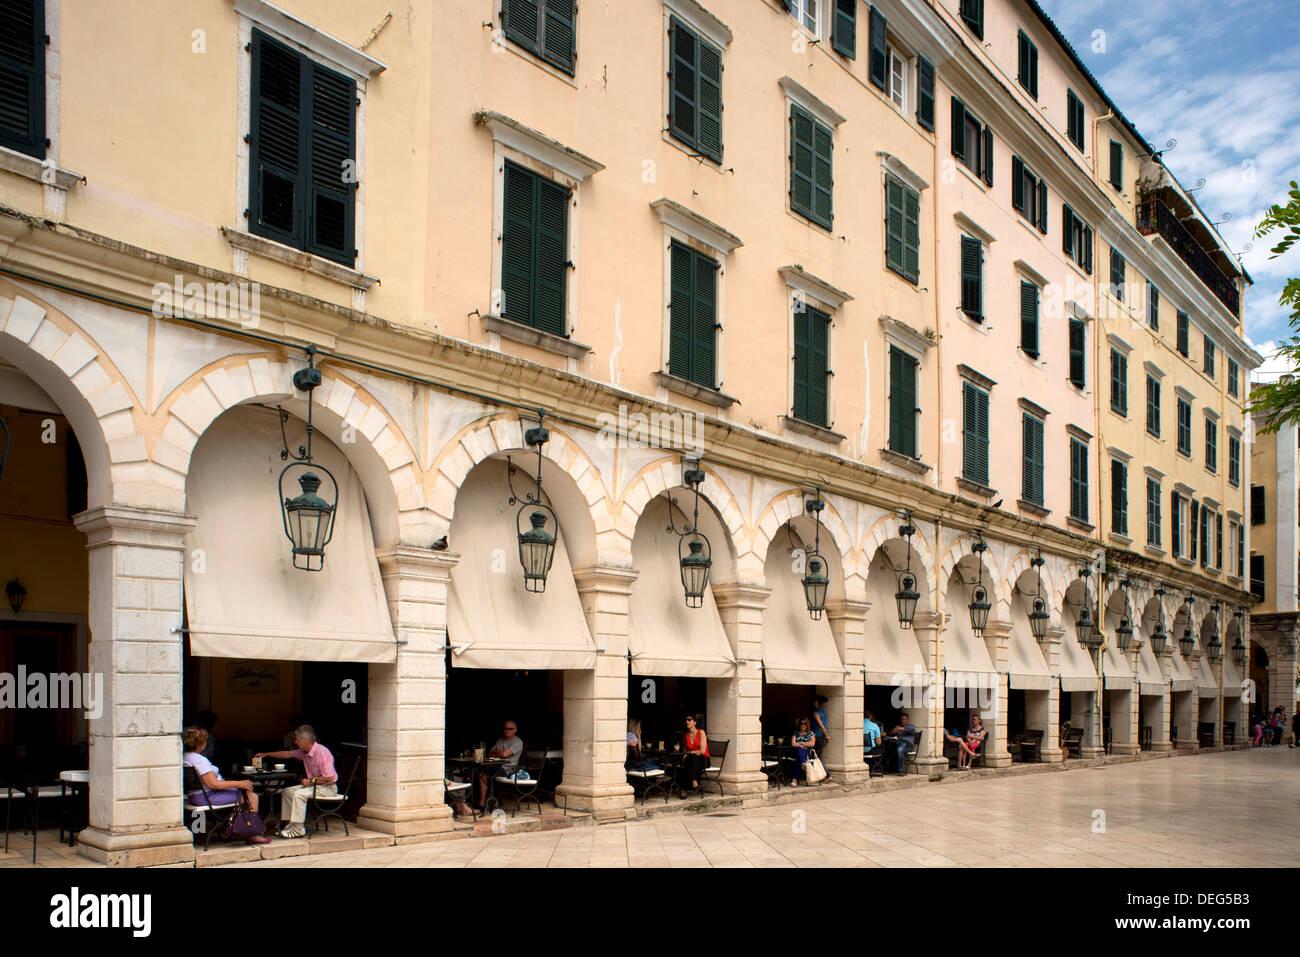 French Architect the liston, a stylish arcade builta french architect in corfu